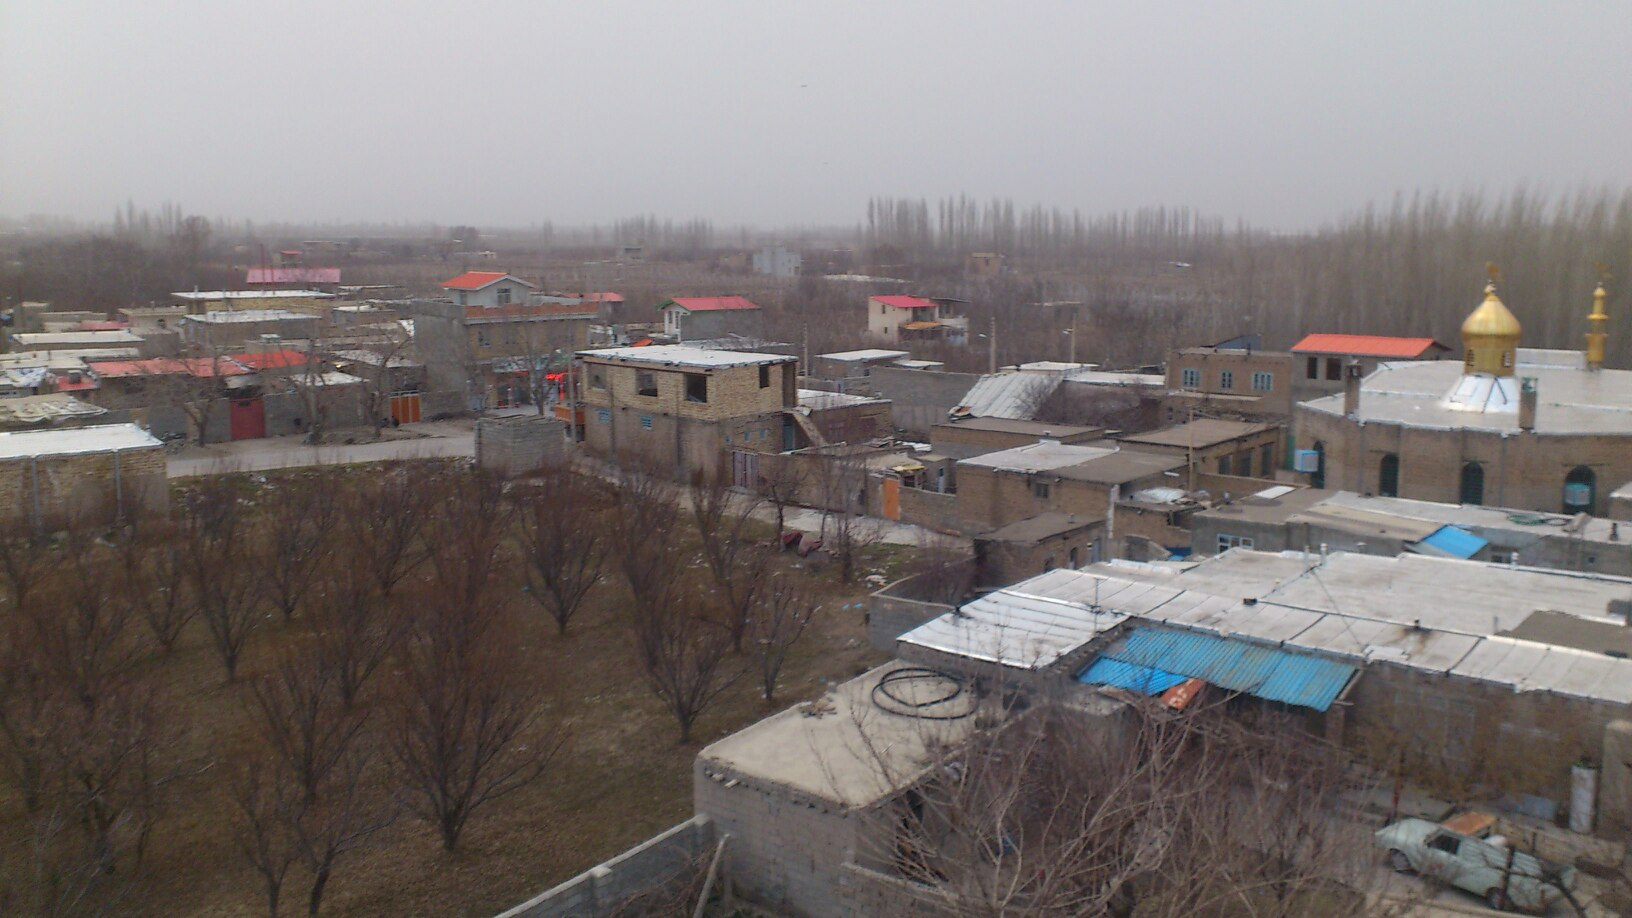 عکس «روستای میرشکارلو»زمستان 93